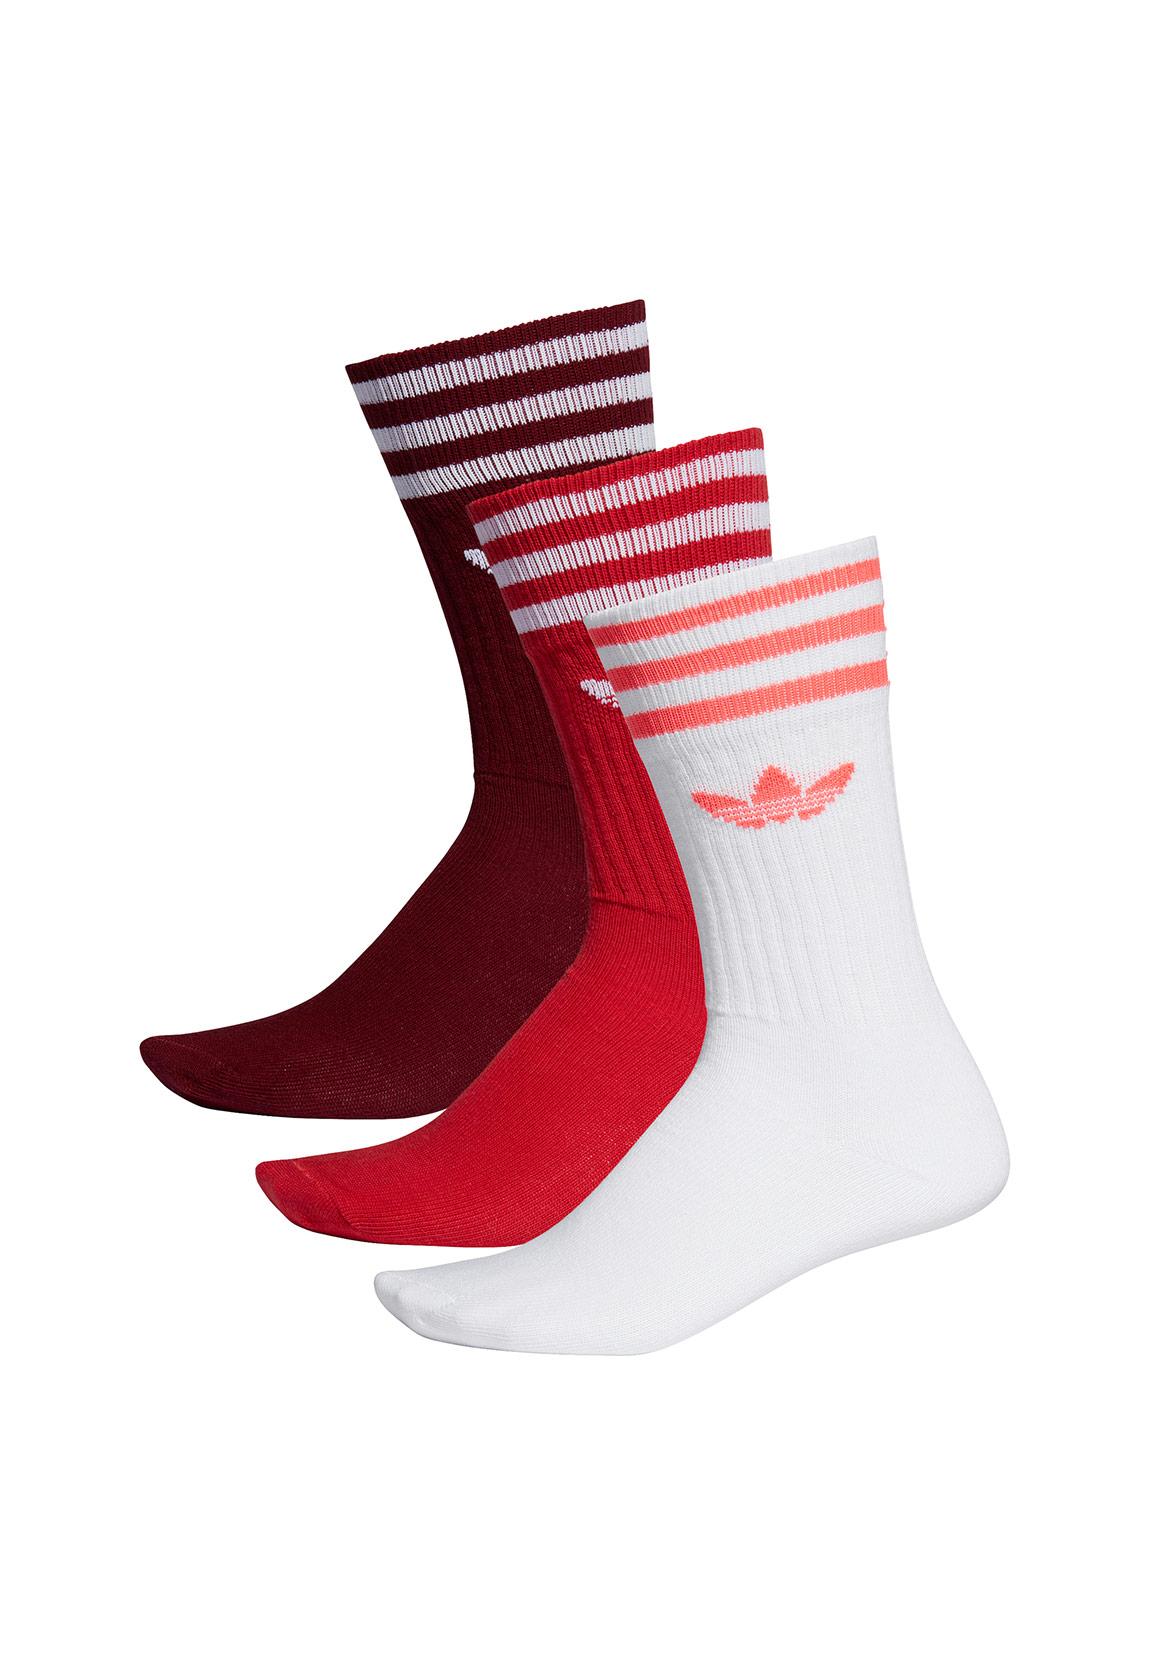 detailed images good service save up to 80% Adidas Originals Socken Dreierpack SOLID CREW ED9360 Weiß Rot